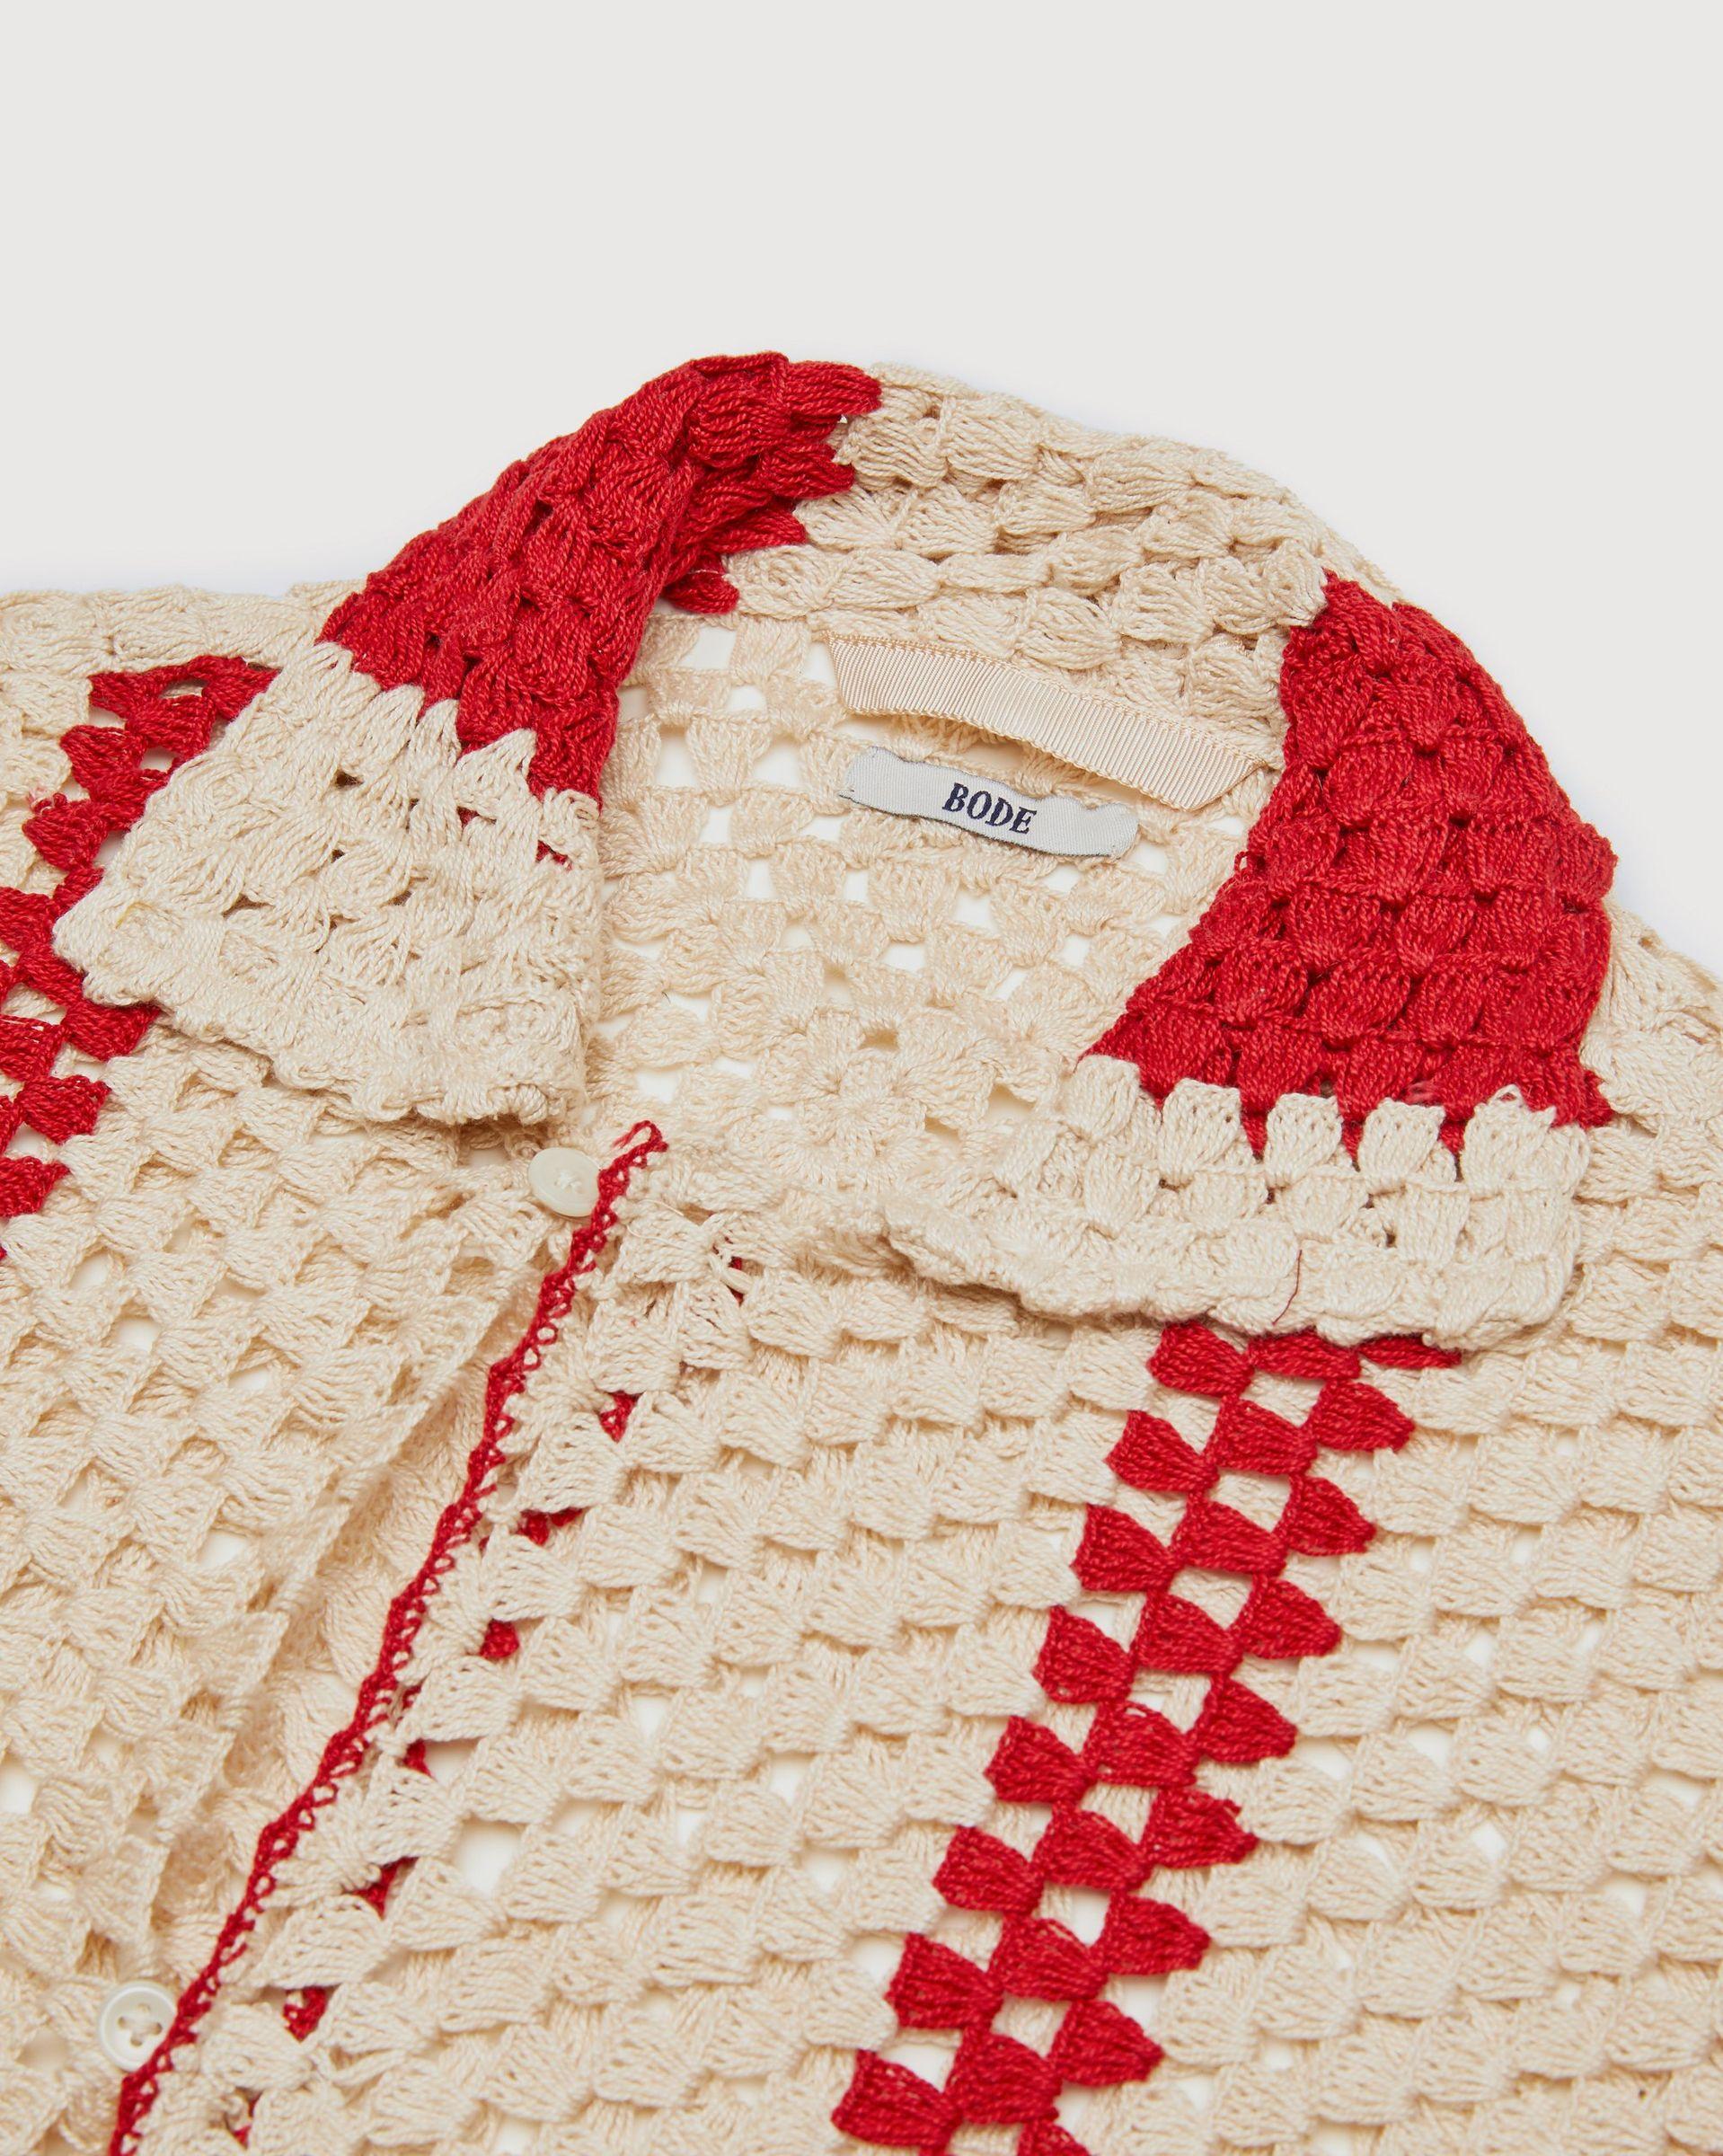 BODE - Crochet Big Top Shirt White Red - Image 4